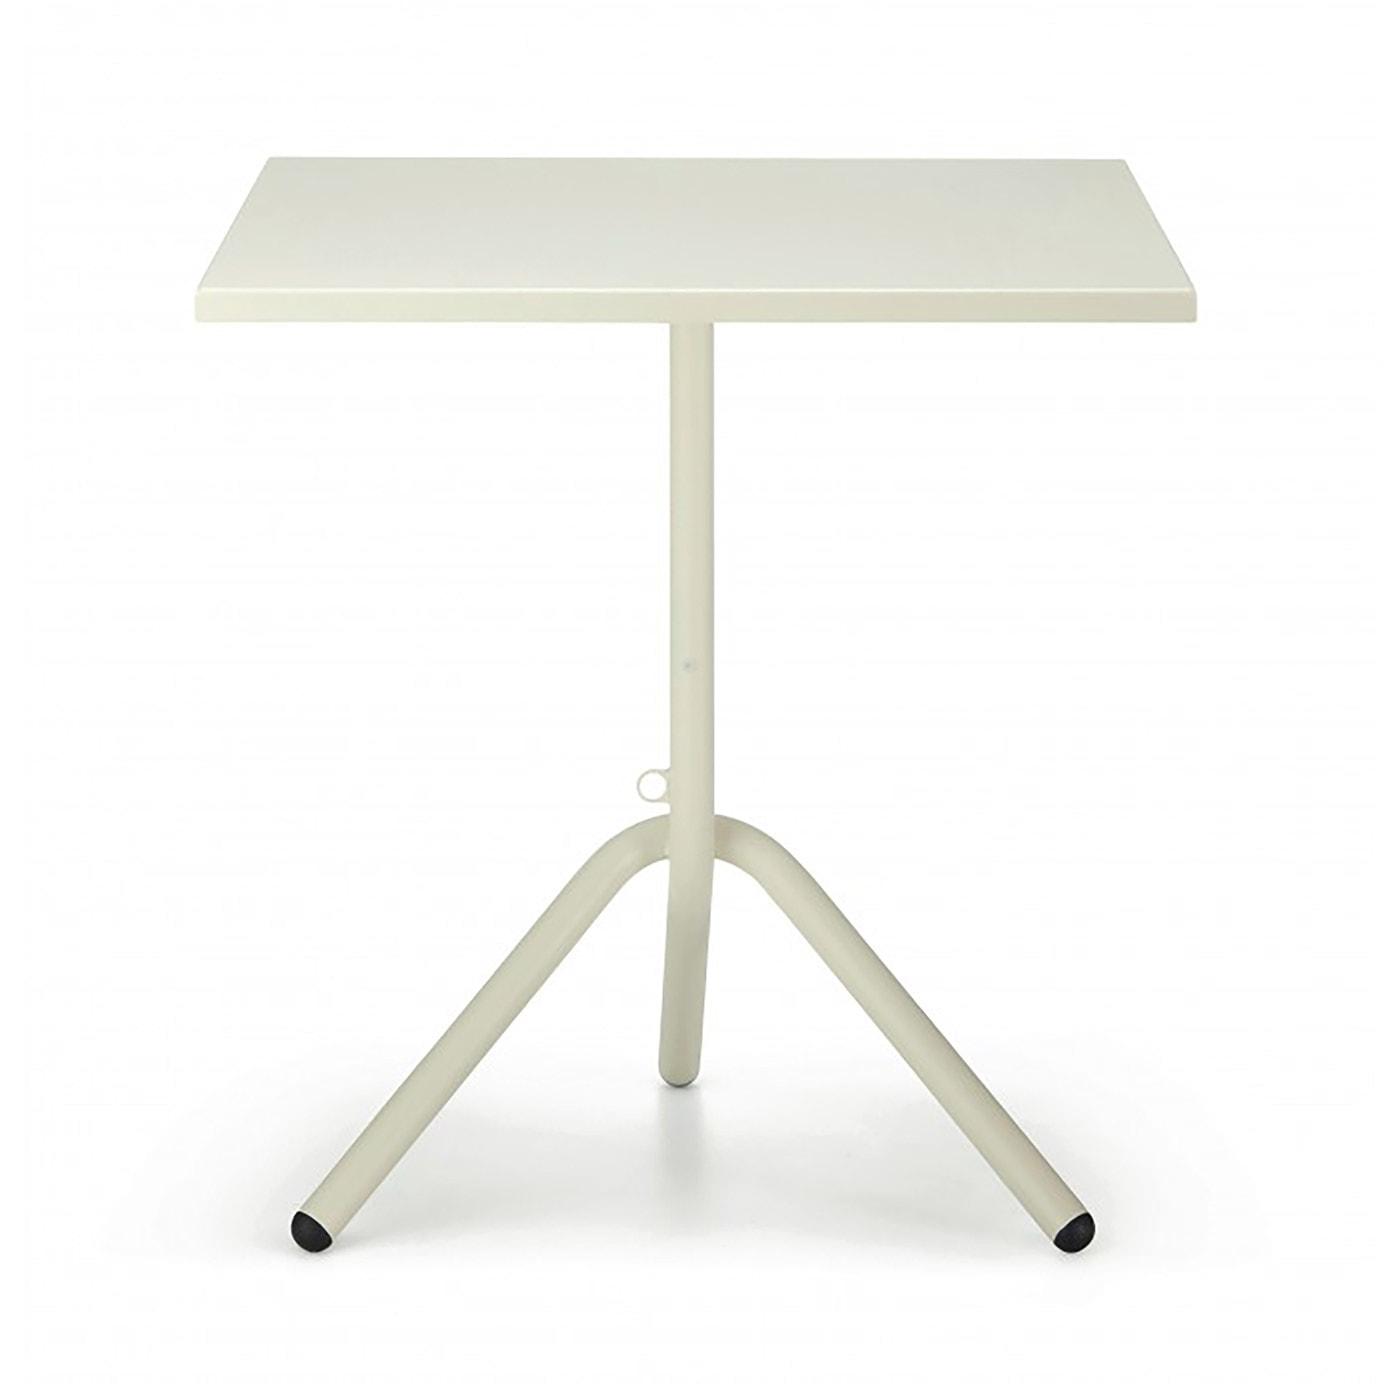 TA COLOS tavolino quadrato